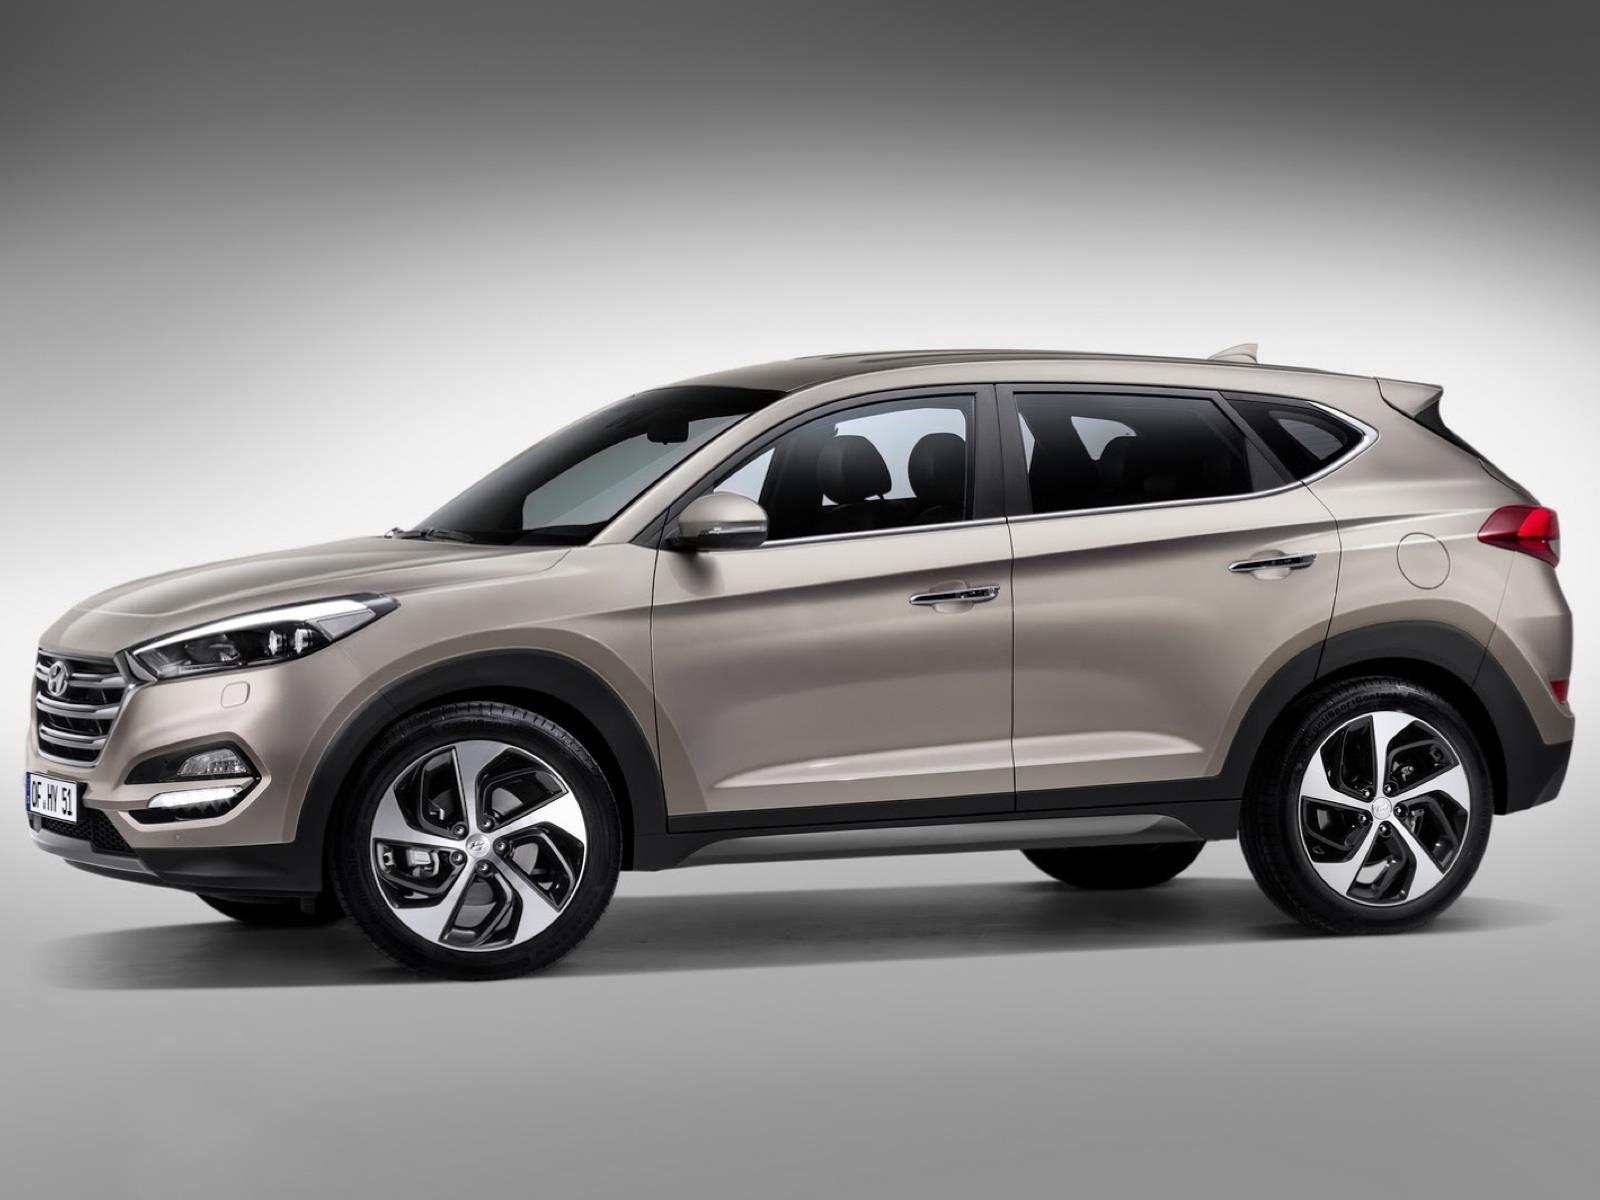 Autoshow De Ginebra 2015 Hyundai Tucson 2016 Luce M 225 S